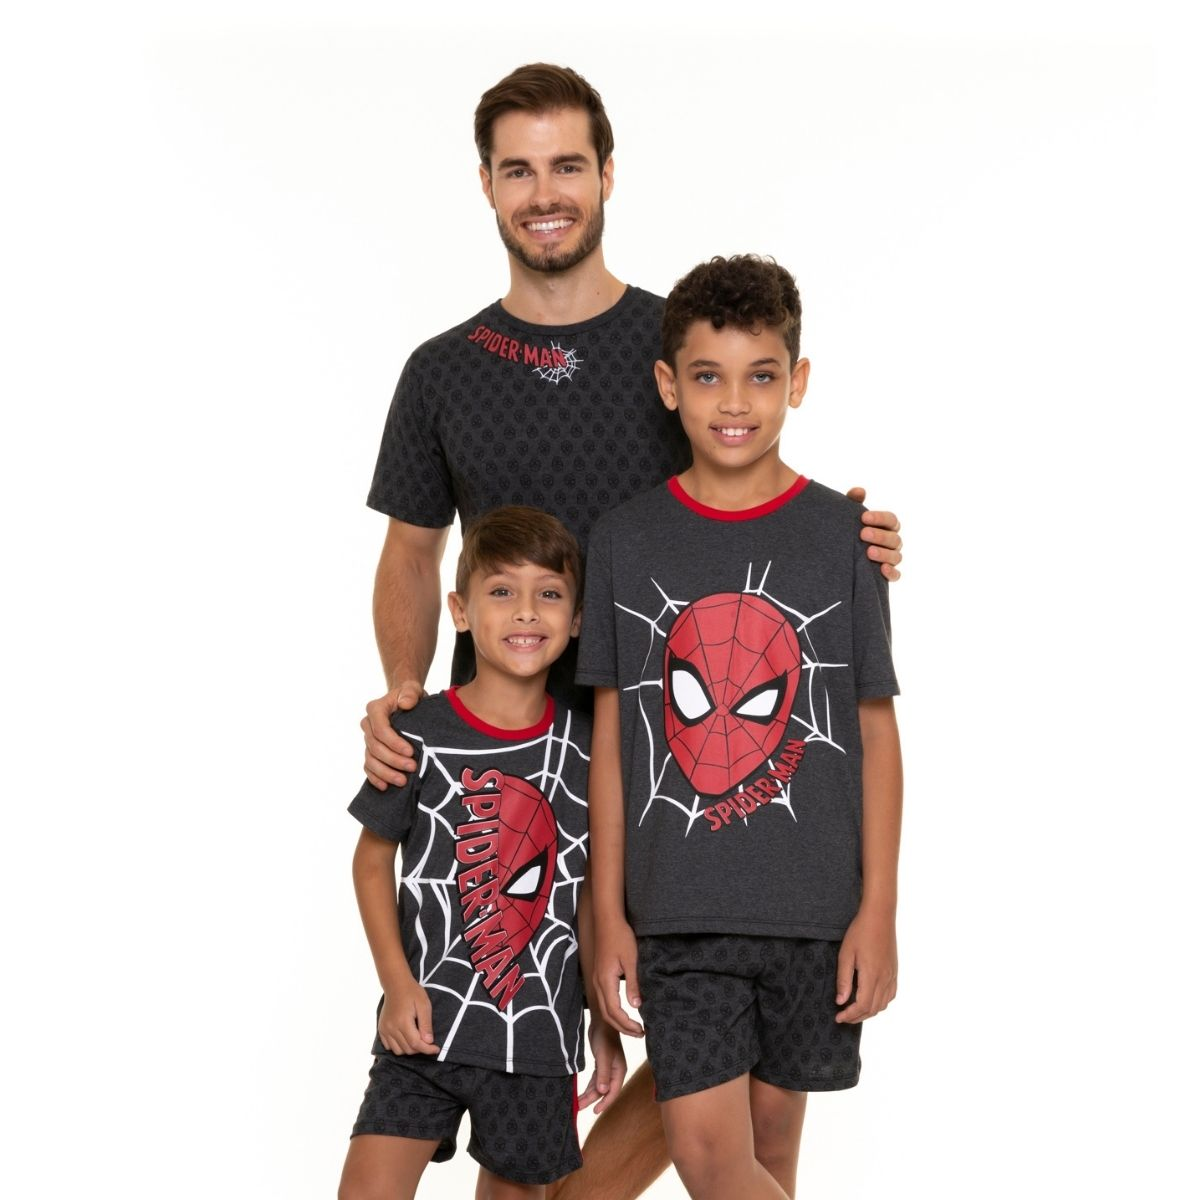 Pijama juvenil menino calor homem aranha marvel